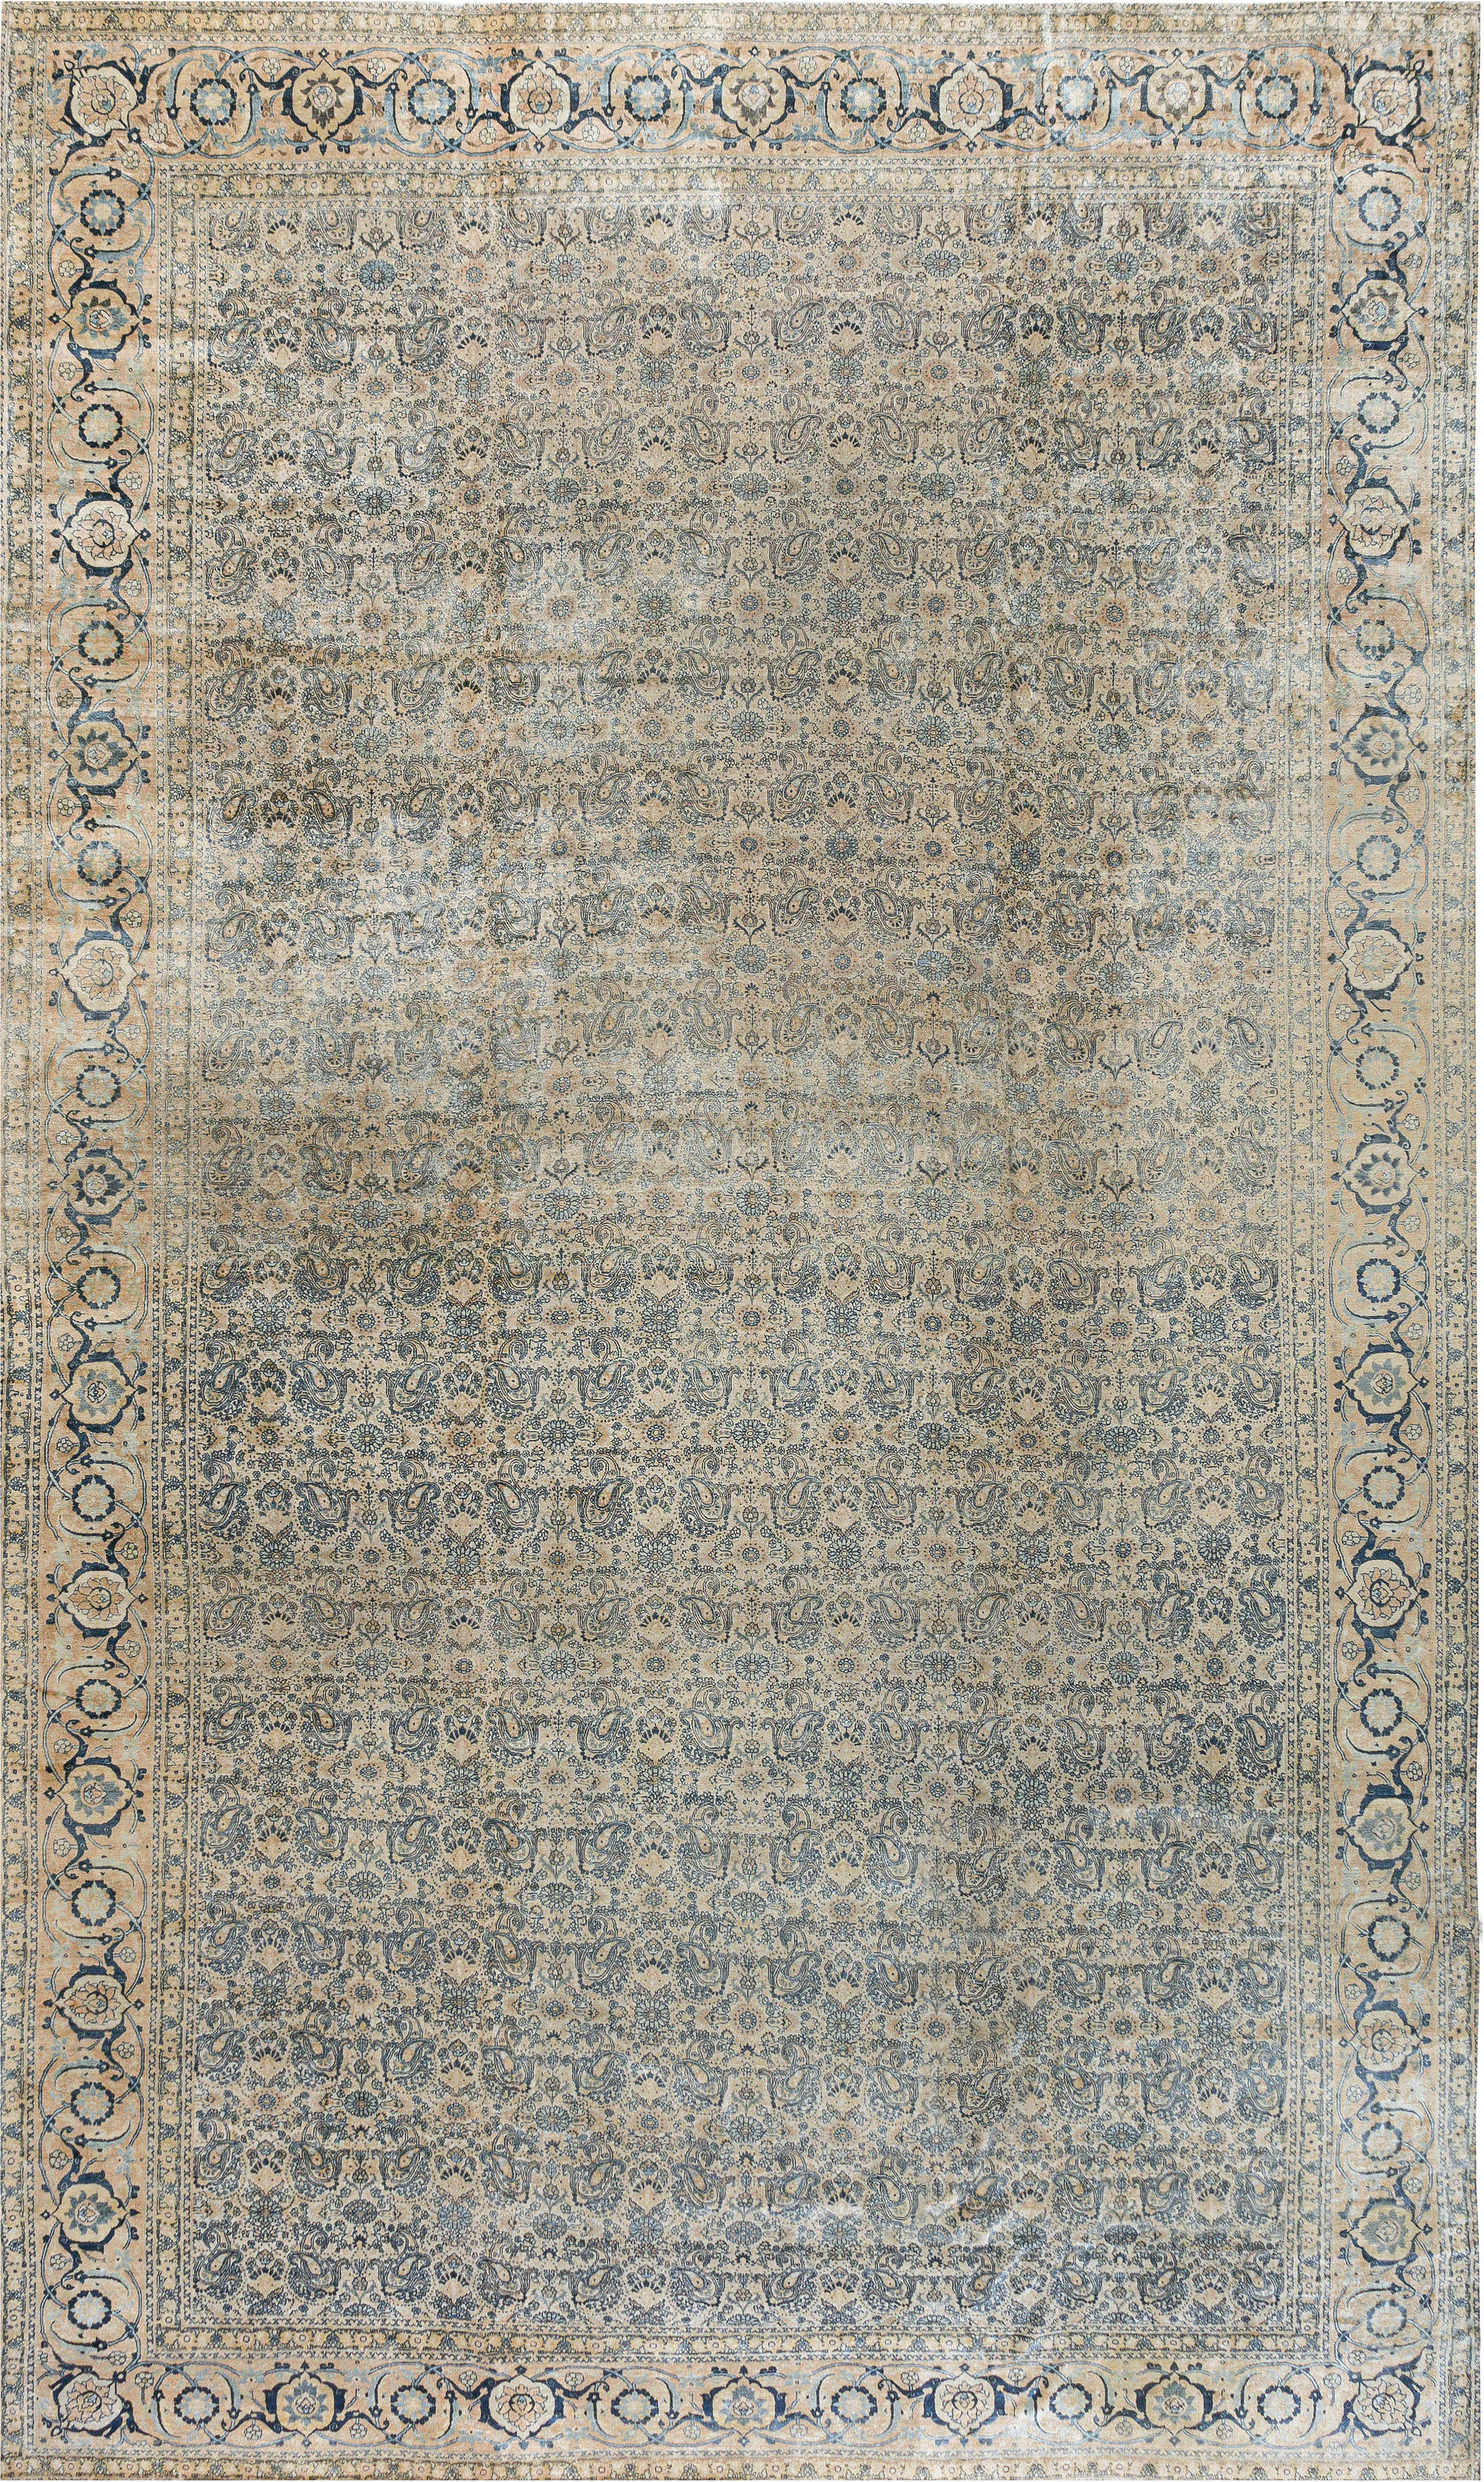 Antique Persian Tabriz Carpet BB7328